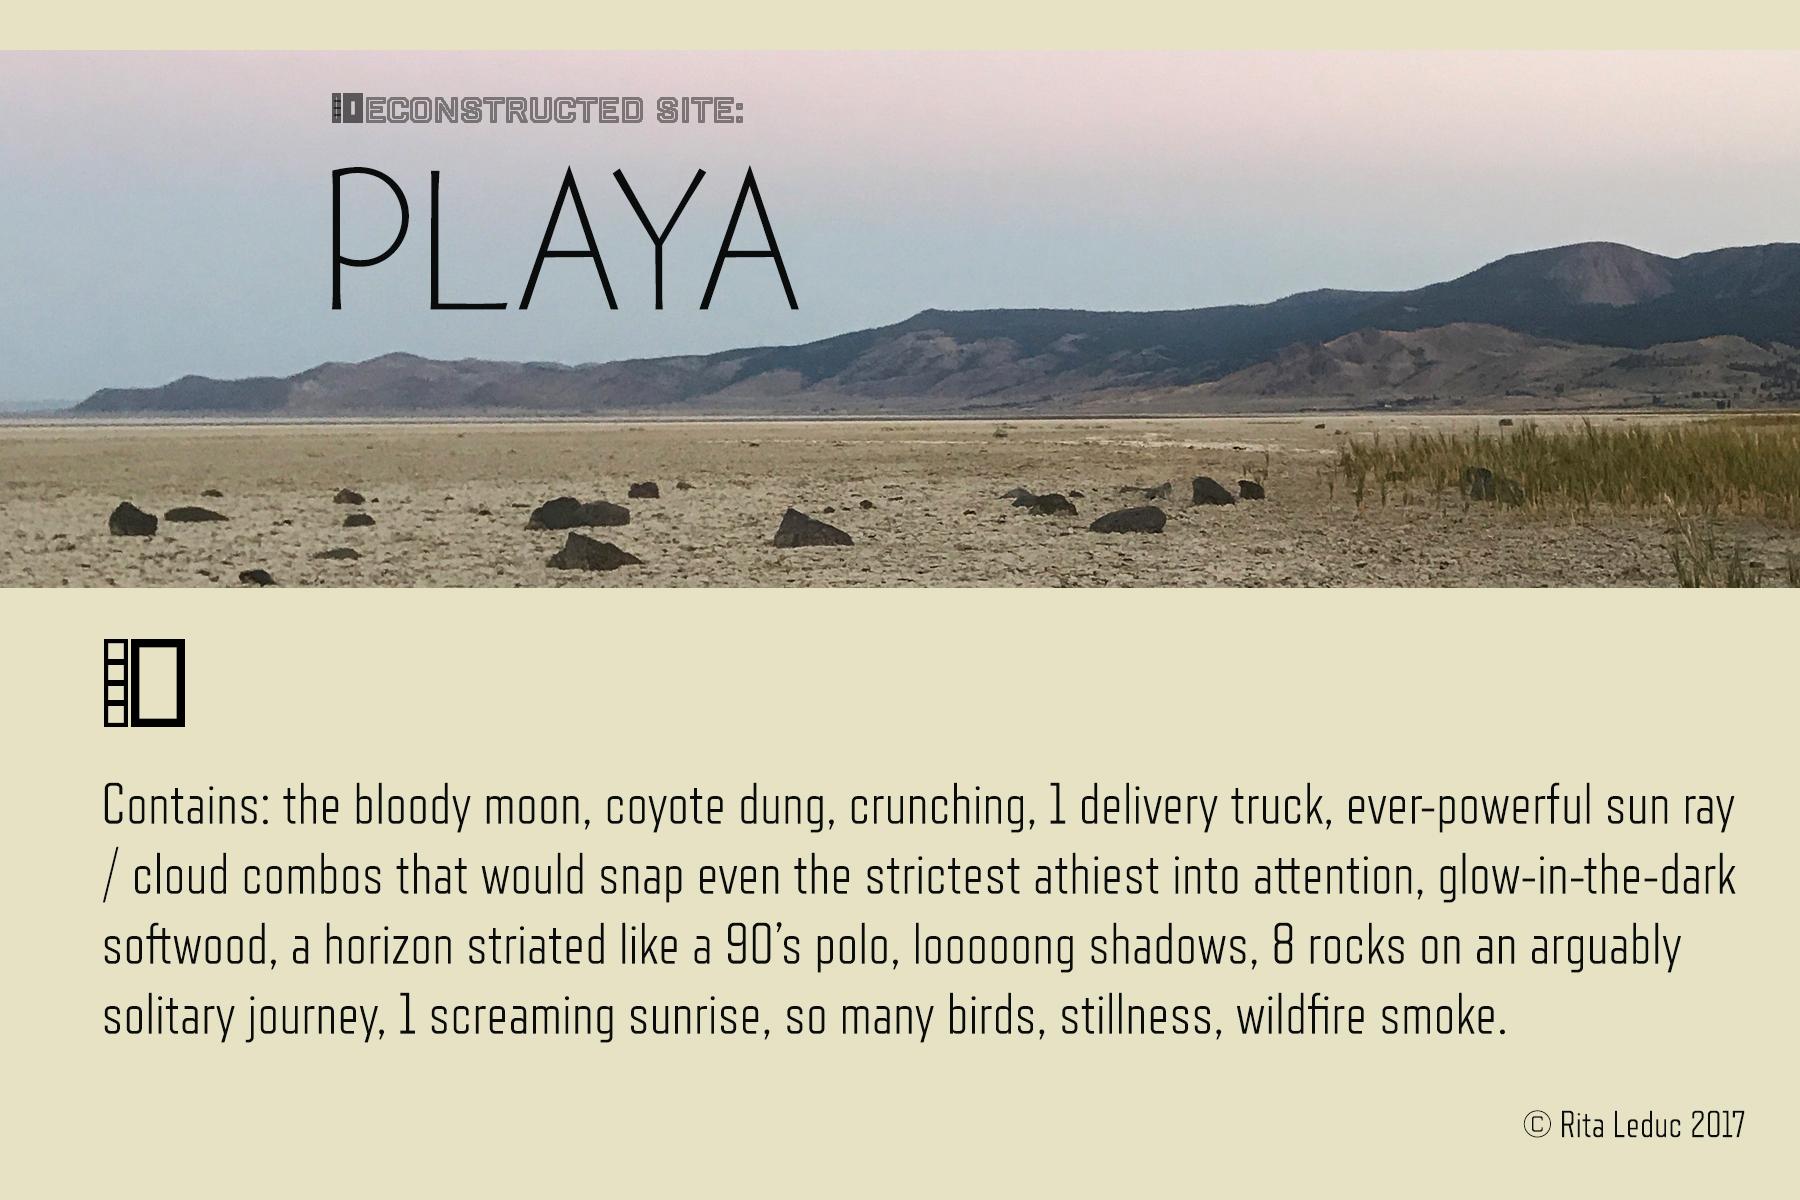 PLAYA: Deconstructed Site